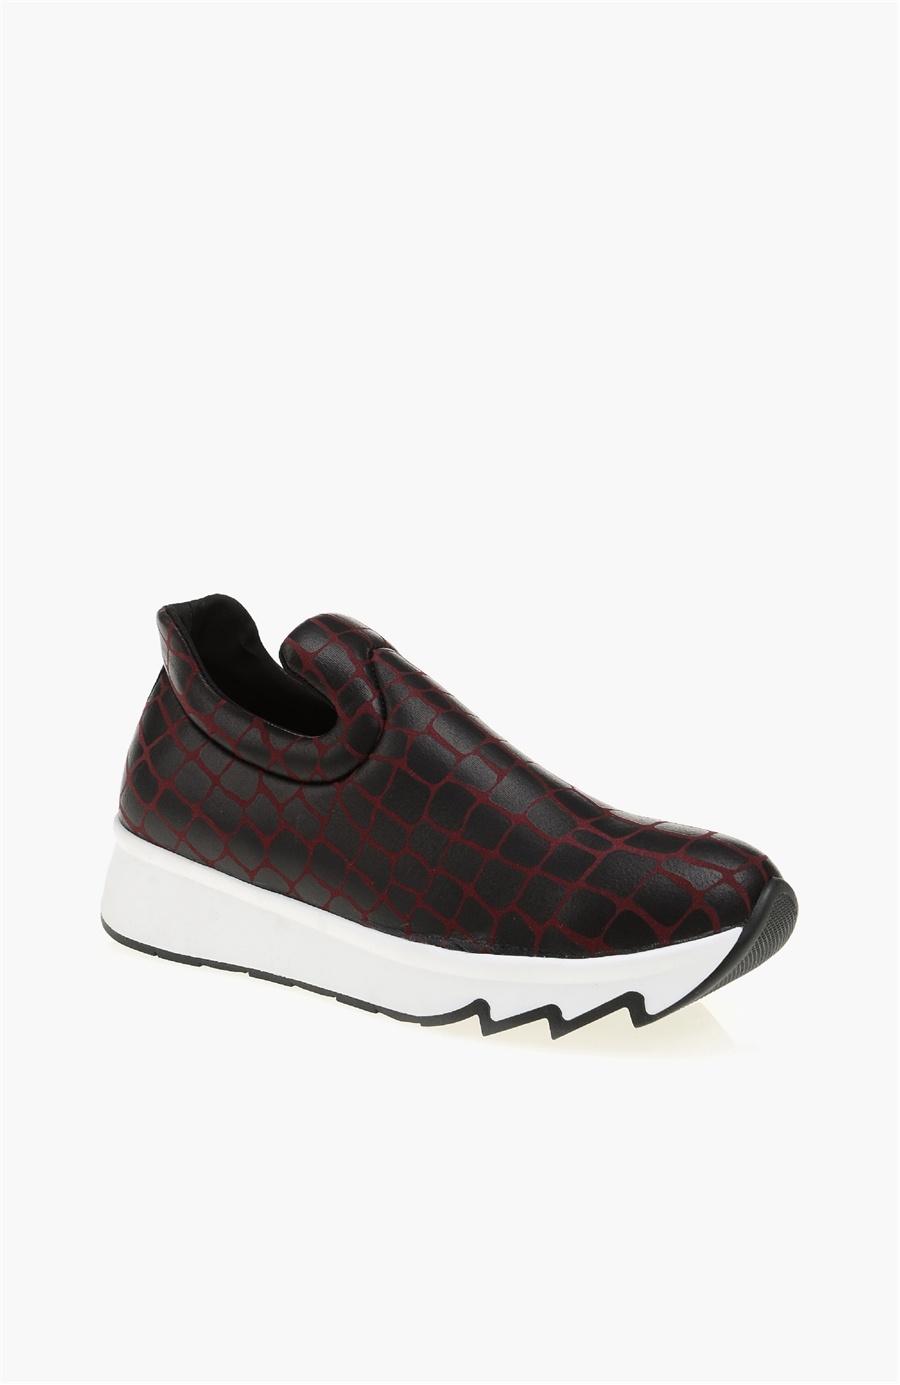 Desenli Bordo Sneaker - Renk Bordo - Network